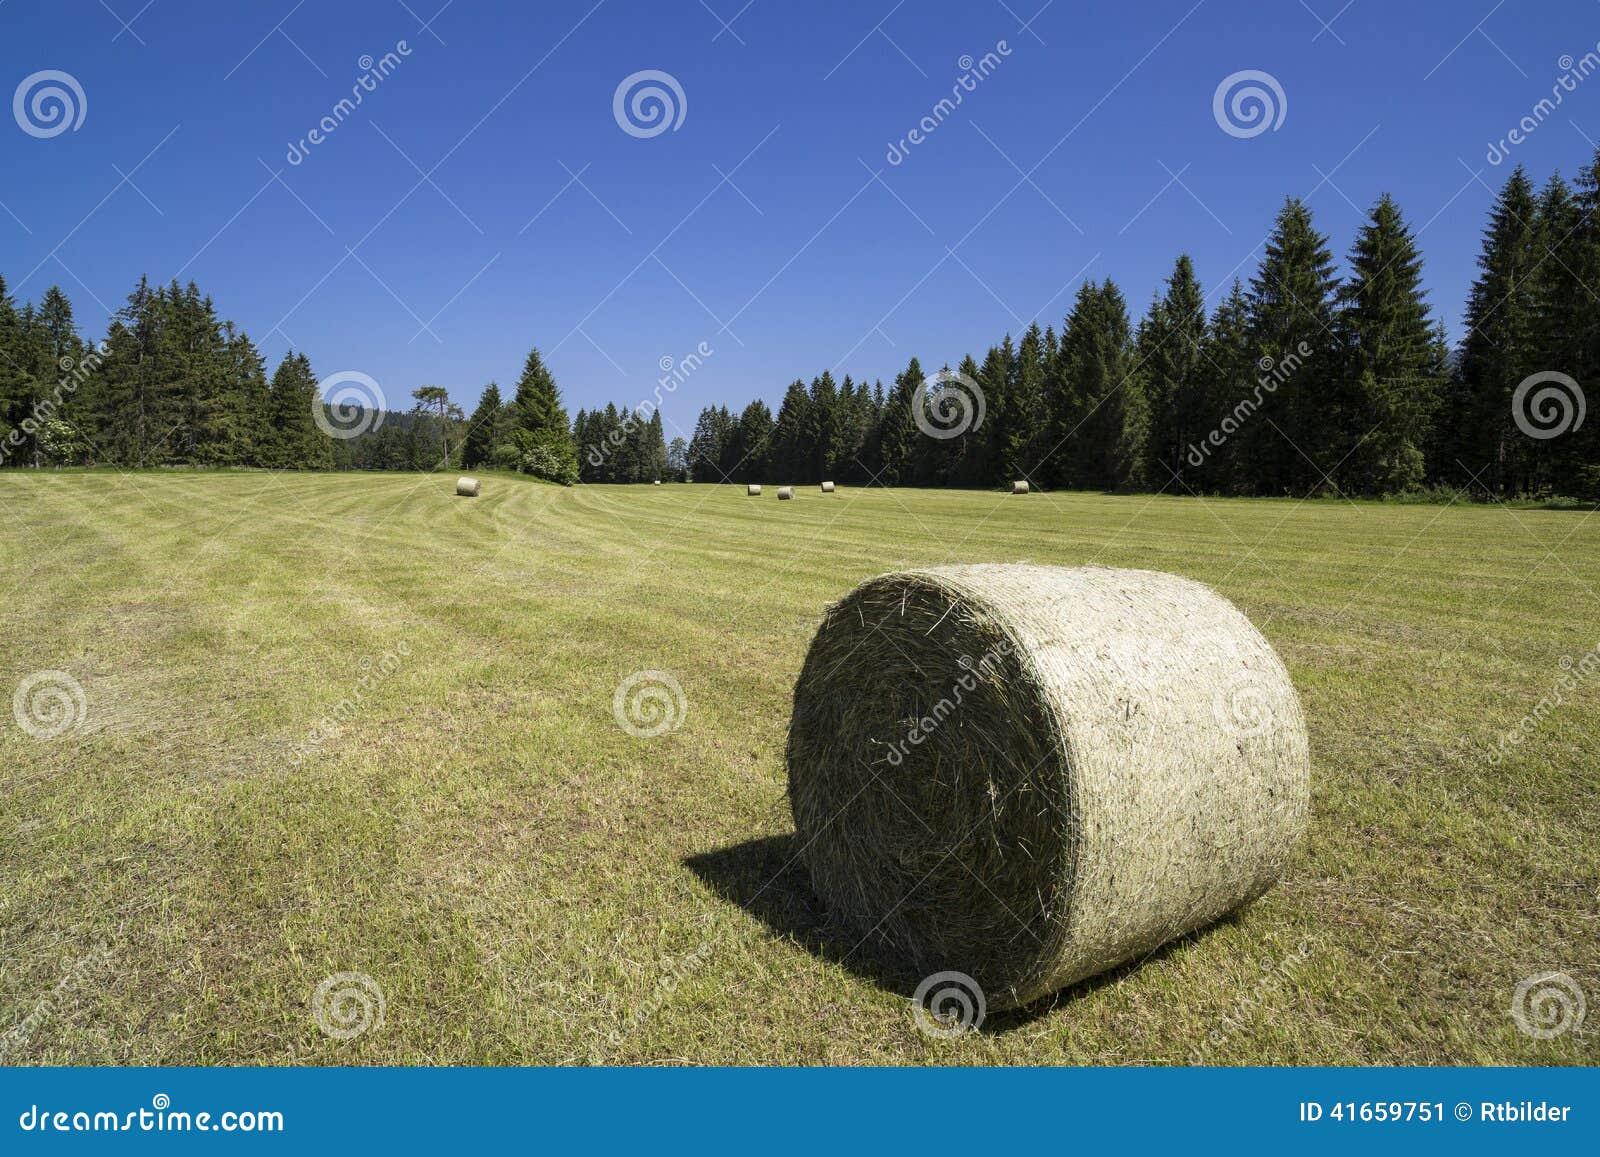 Fields harvesting